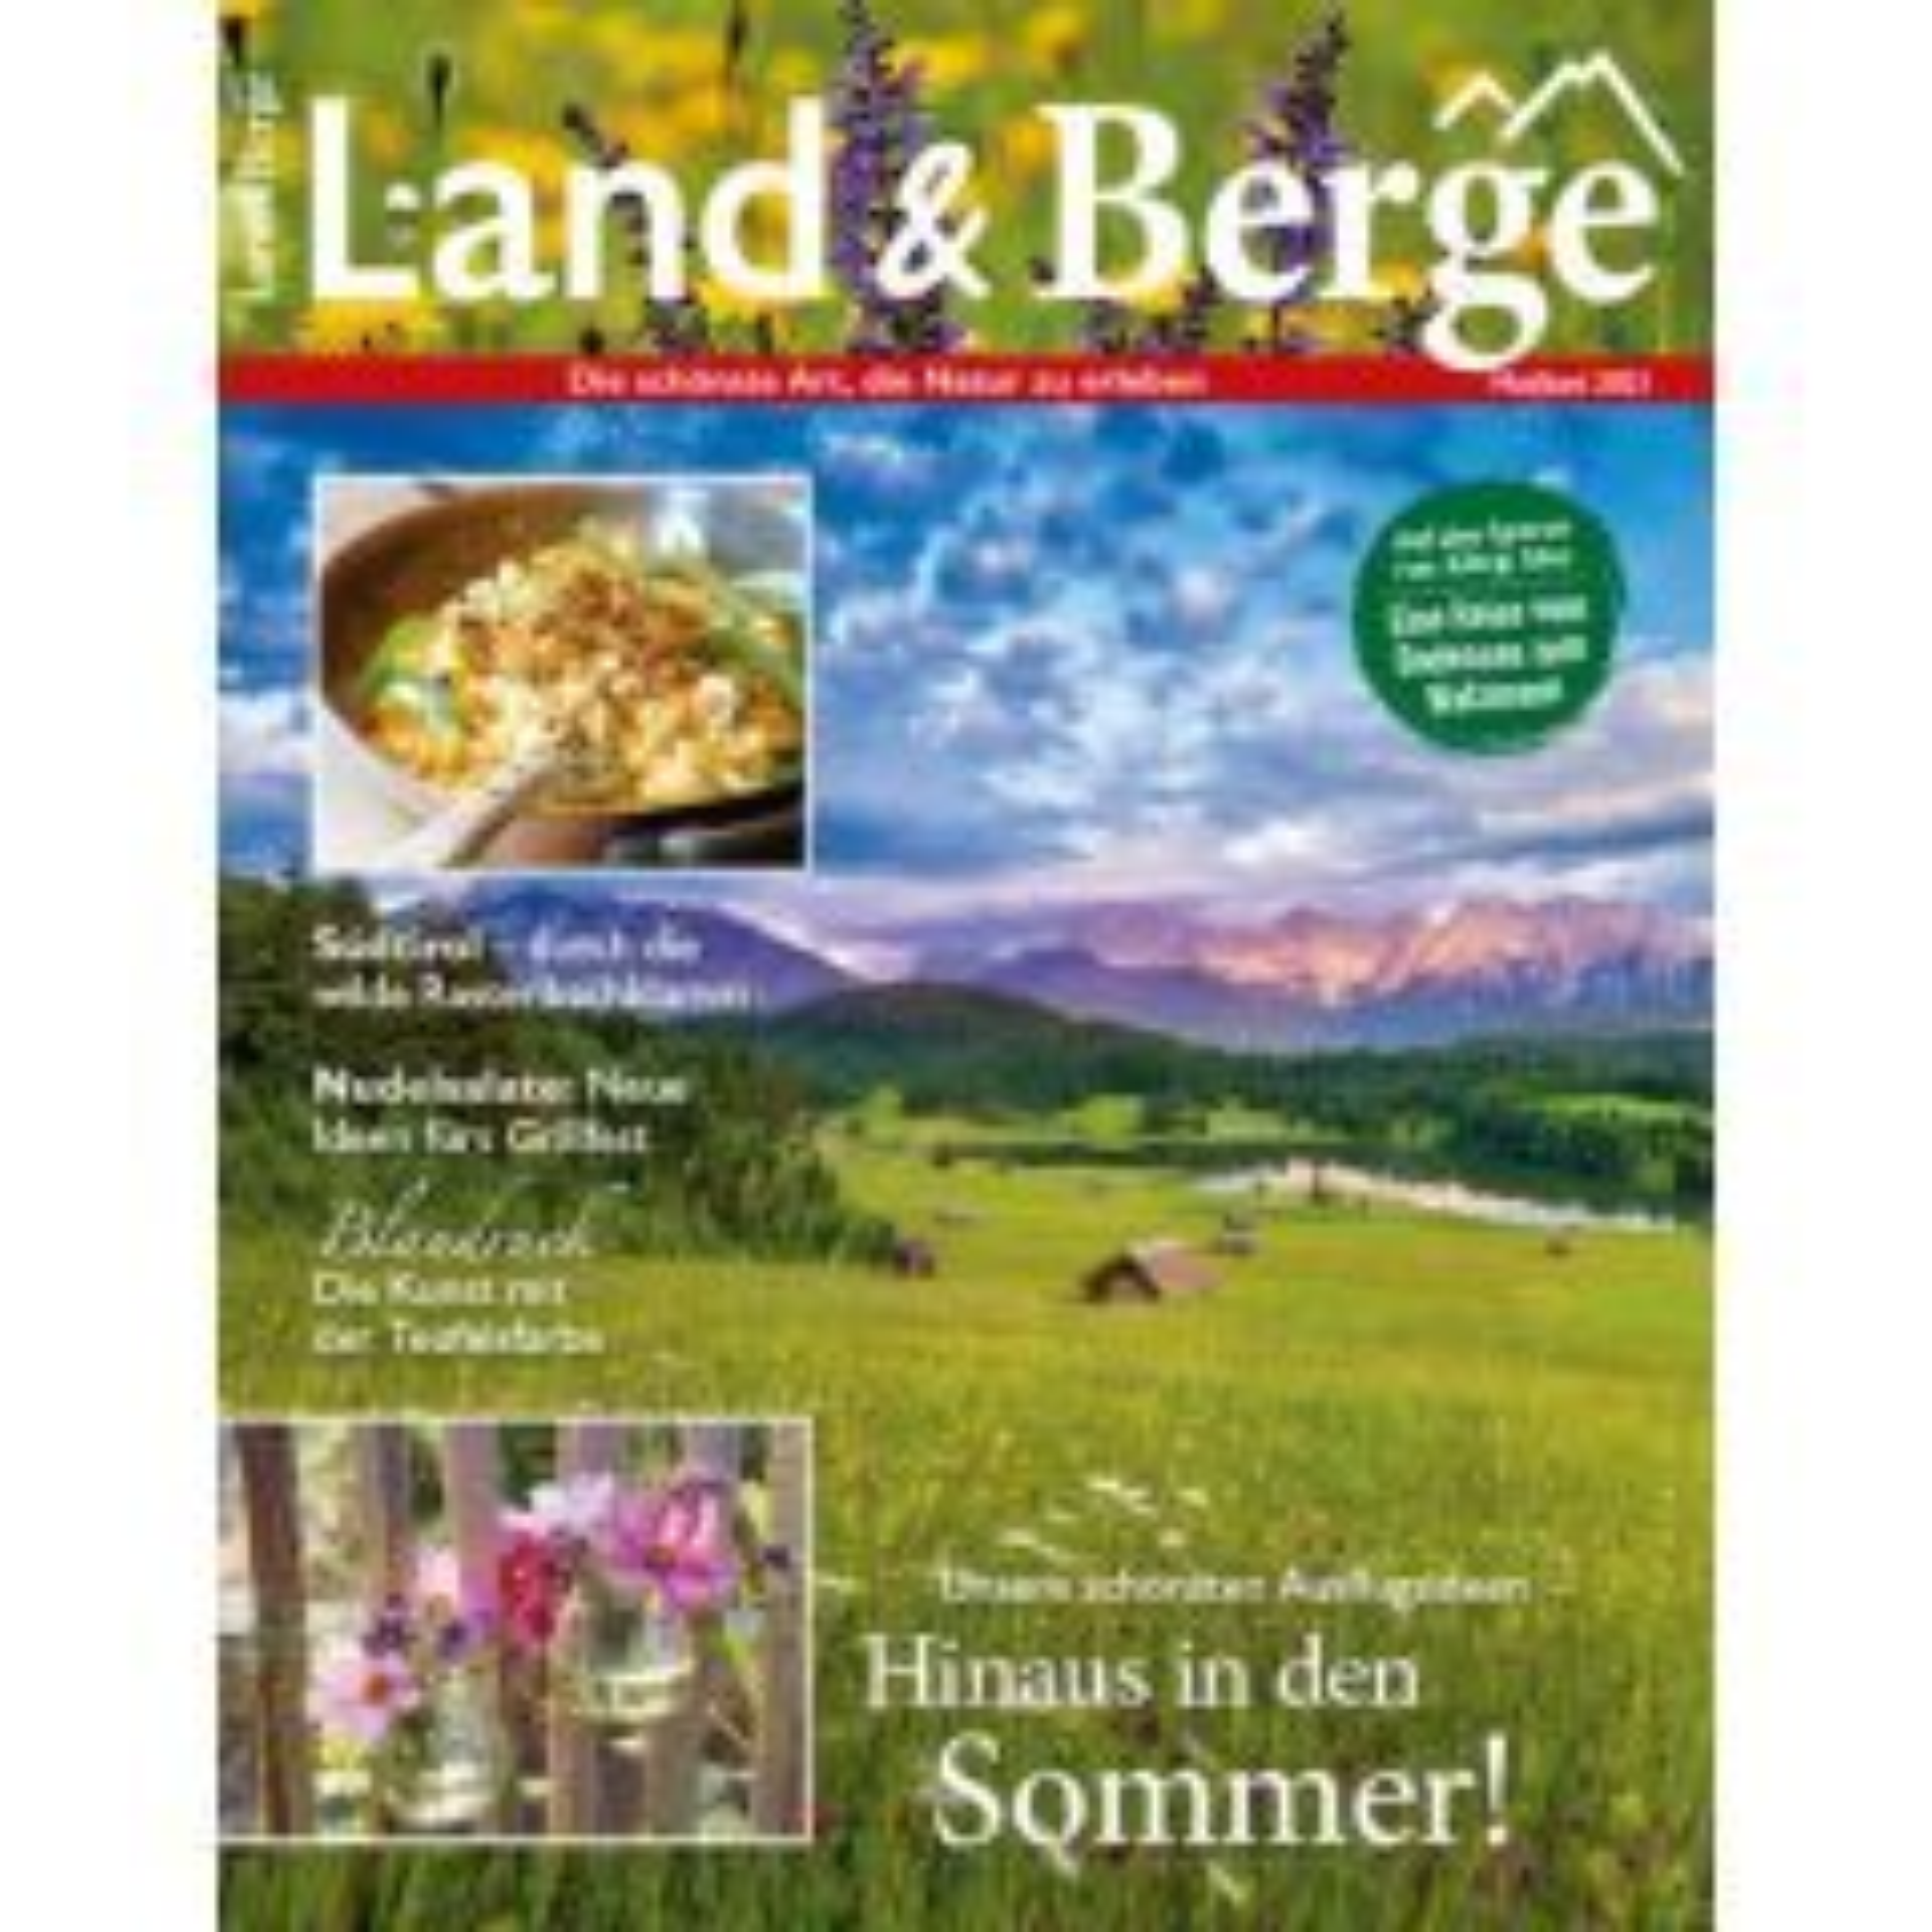 Land & Berge 3/2021